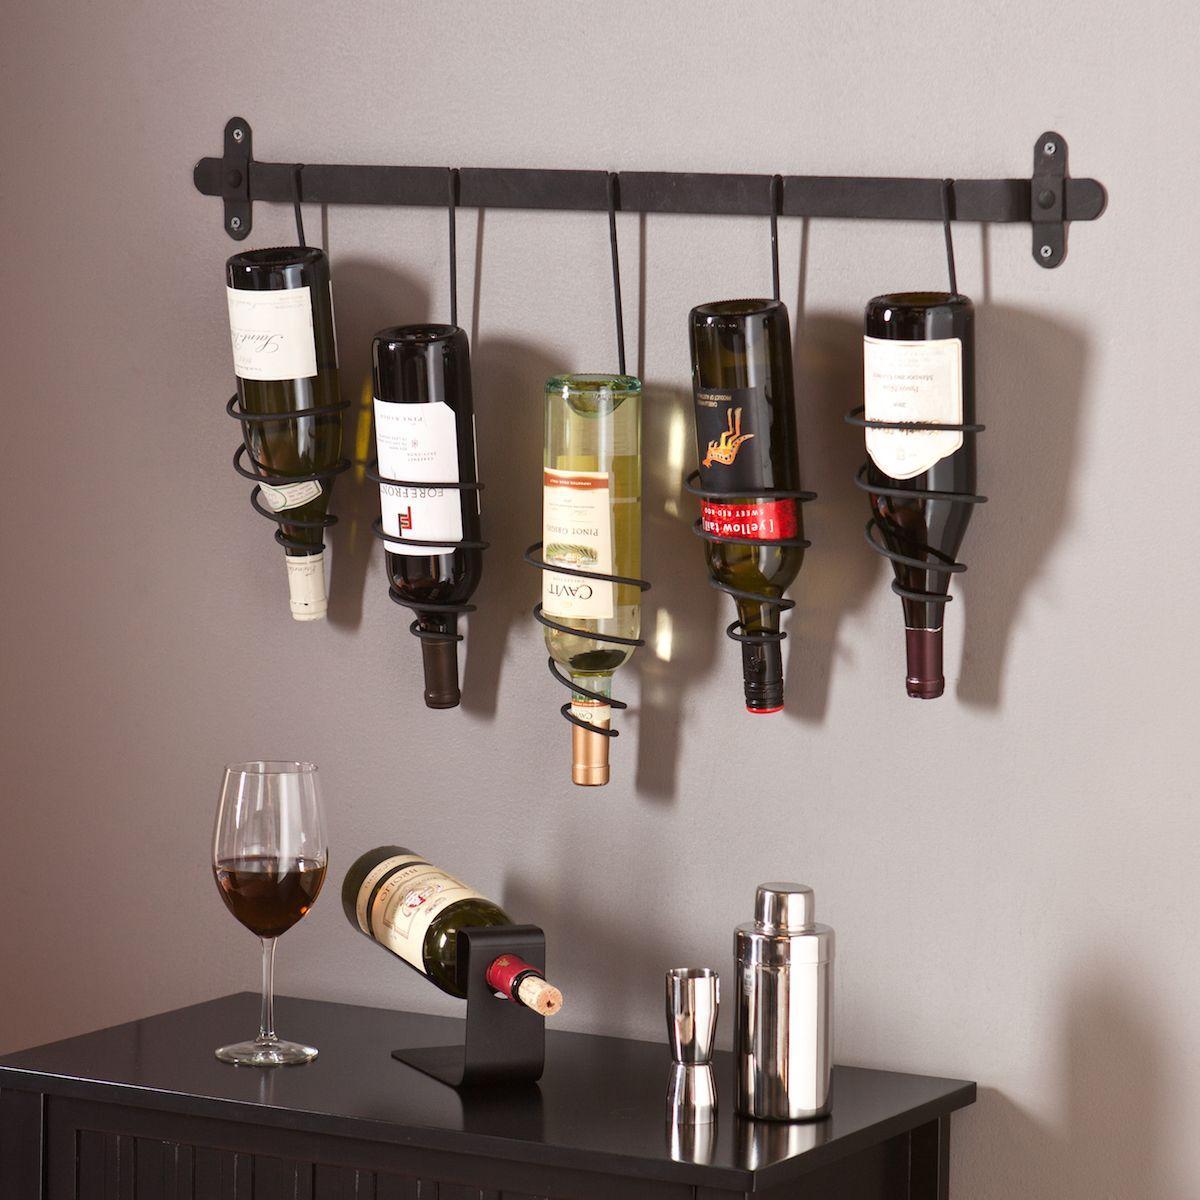 Trigny Wall Mounted Wine Rack Wine Rack Wall Wall Mounted Wine Rack Bottle Wall